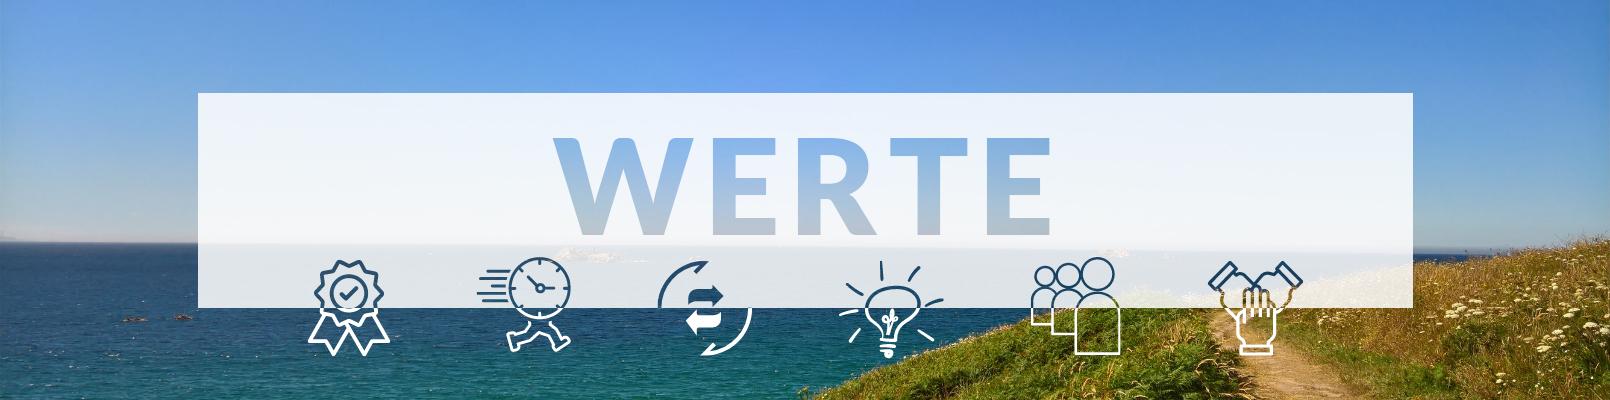 werte-firma-guedo